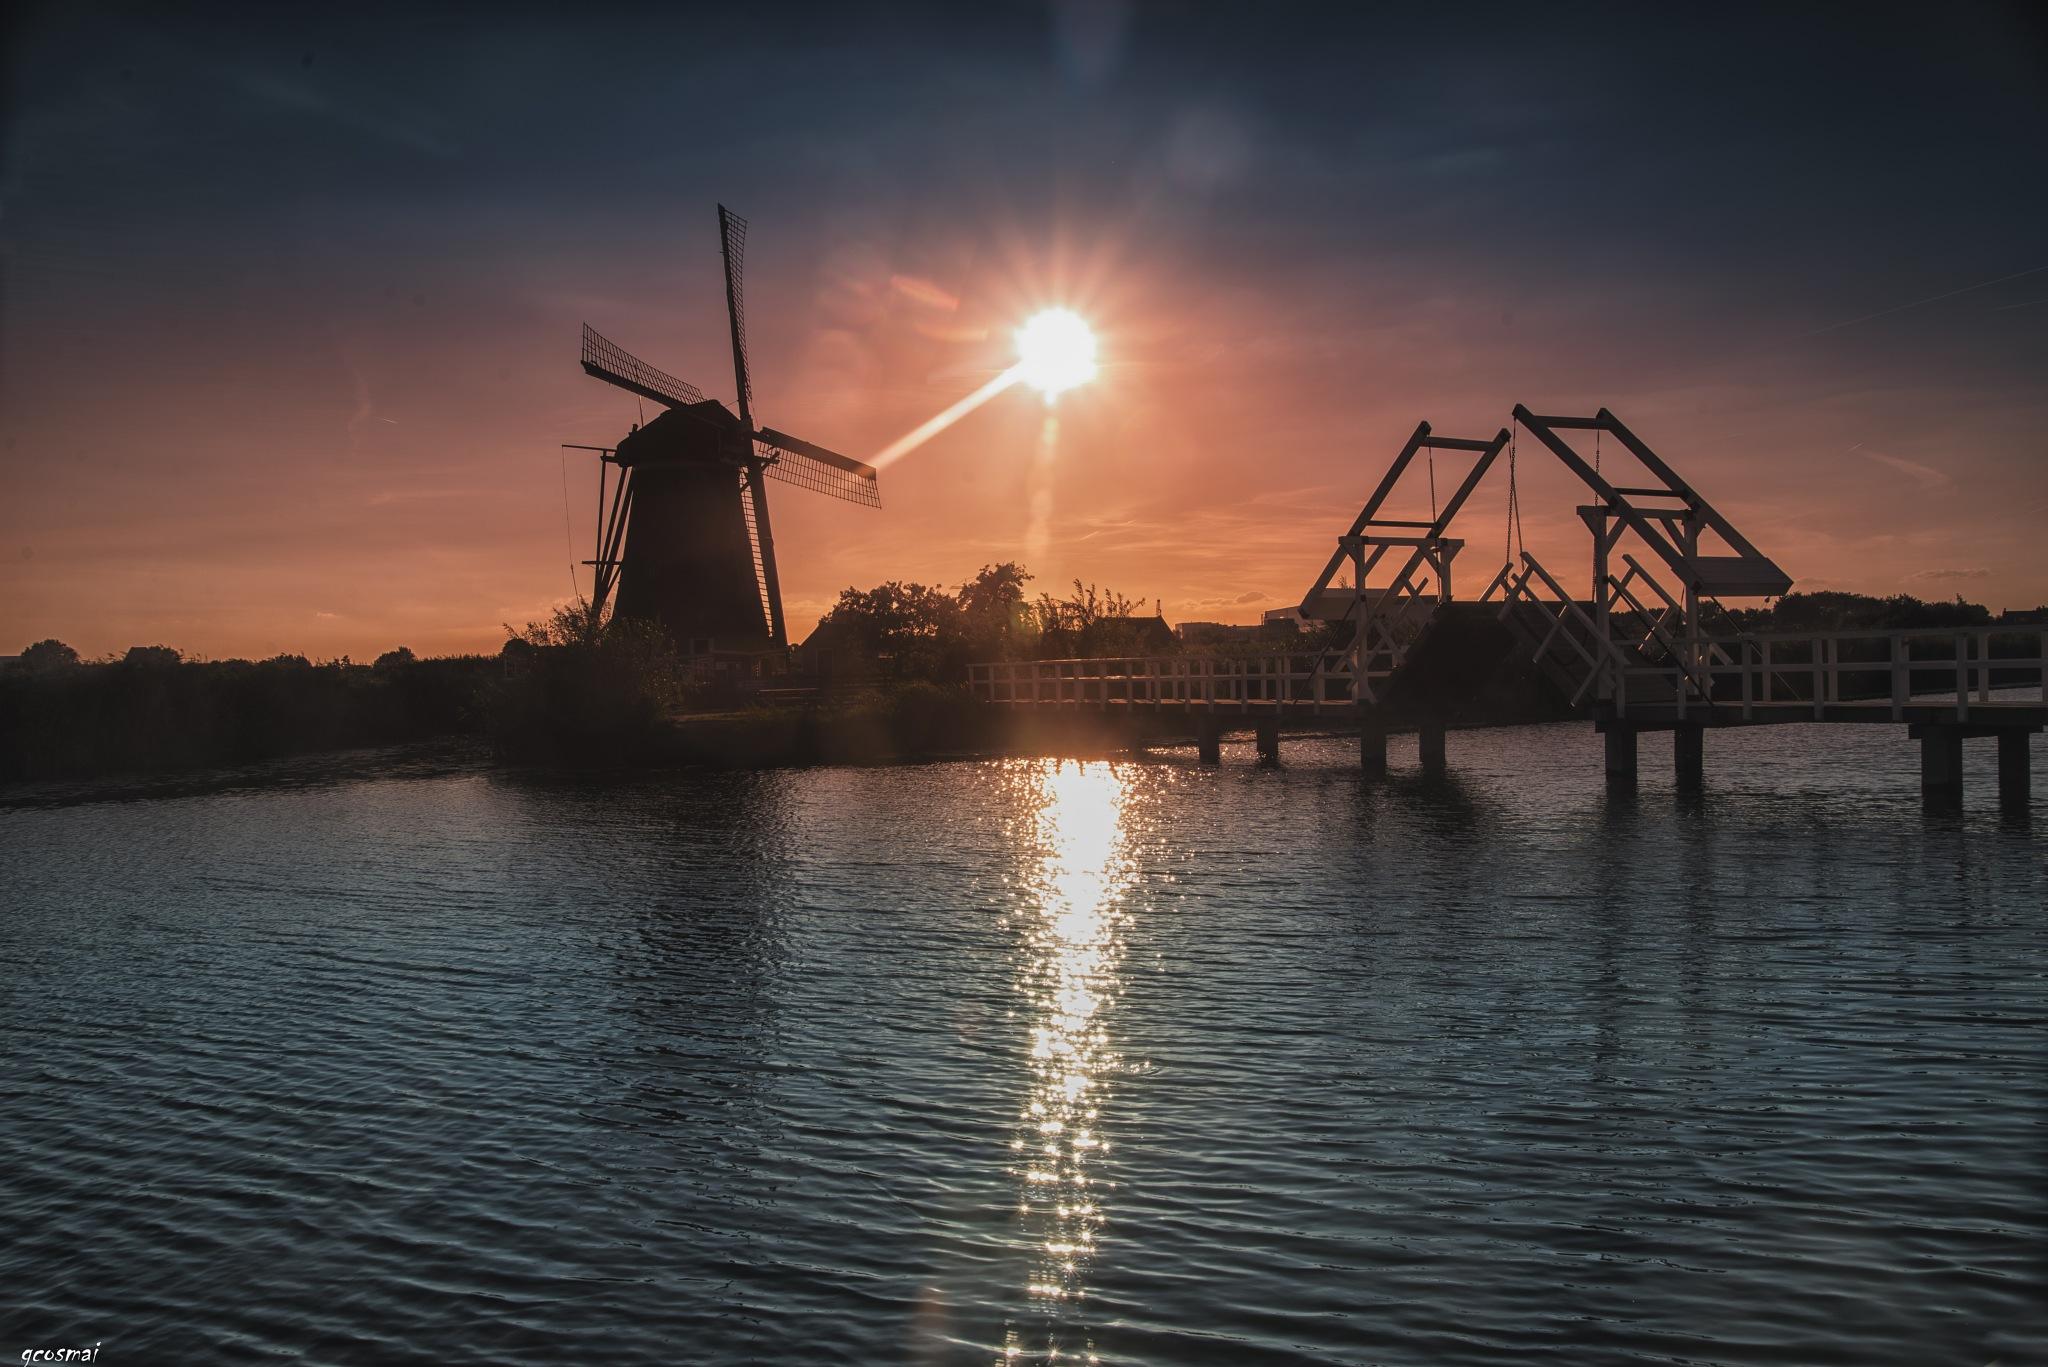 Sunset, windmill and a bridge by G.Cosmai